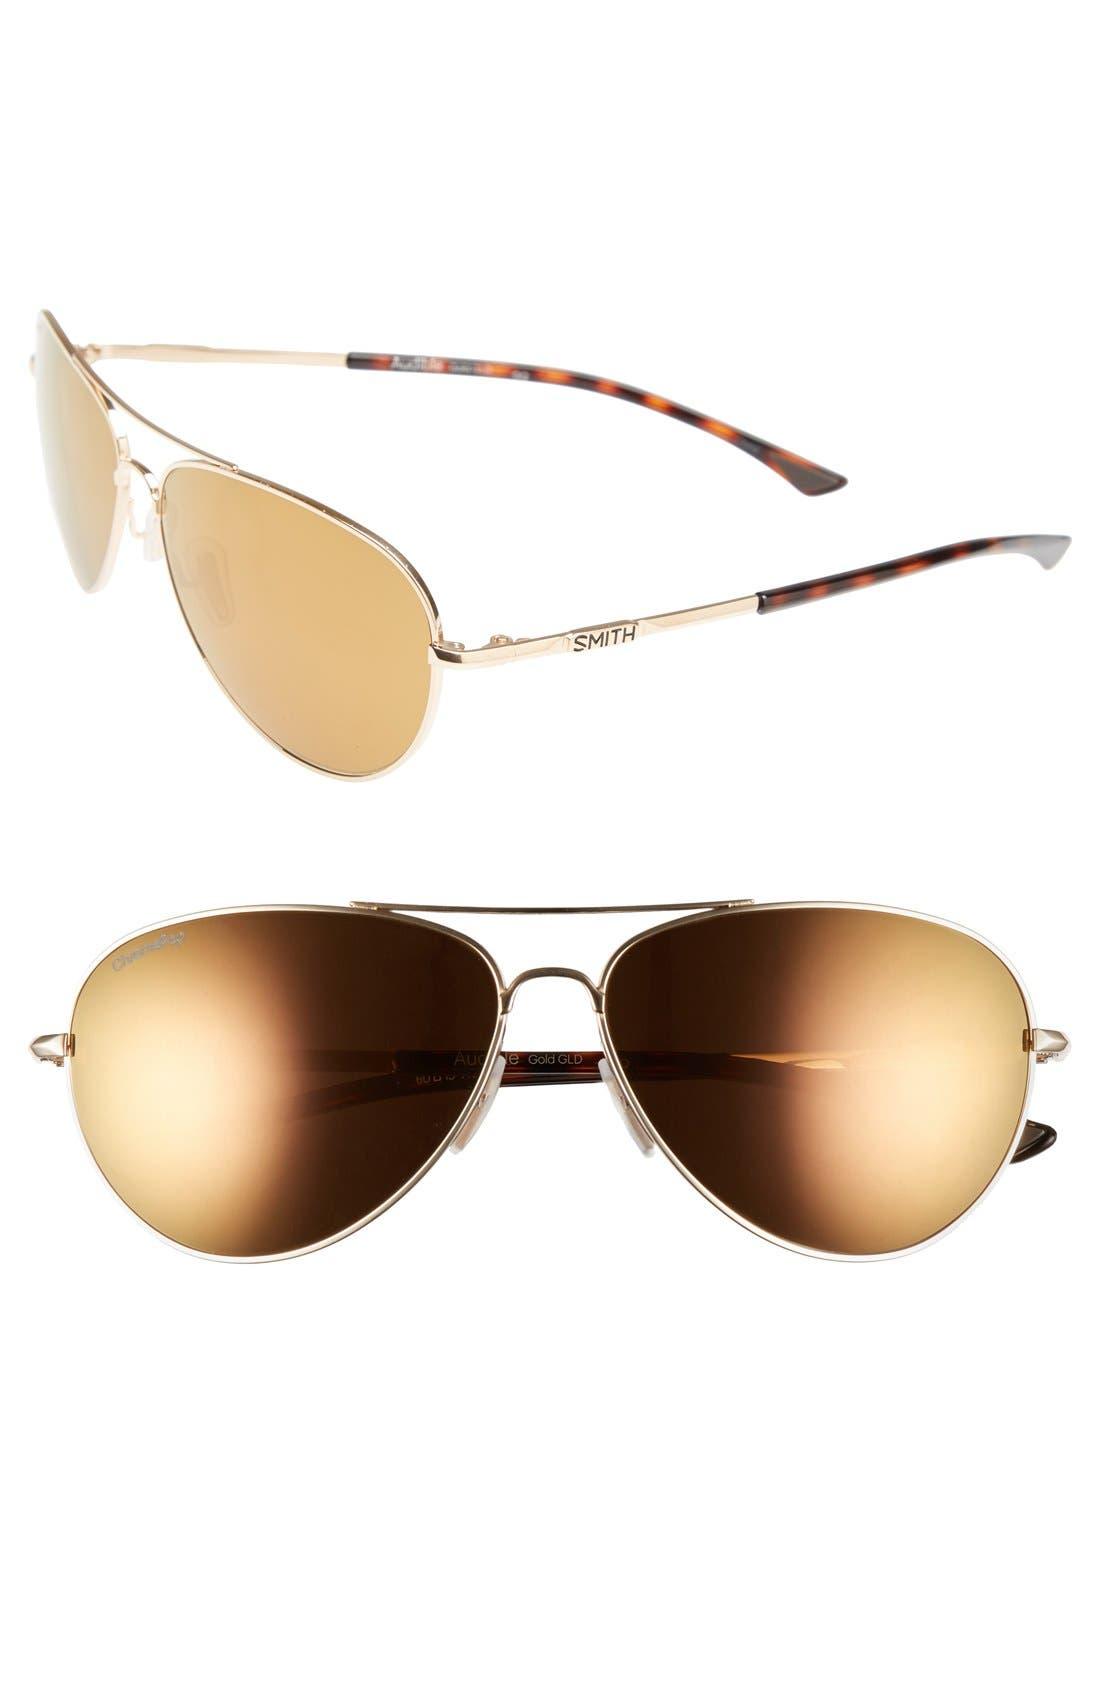 'Audible - ChromaPop' 60mm Polarized Aviator Sunglasses,                             Main thumbnail 1, color,                             Gold/ Polar Bronze Mirror